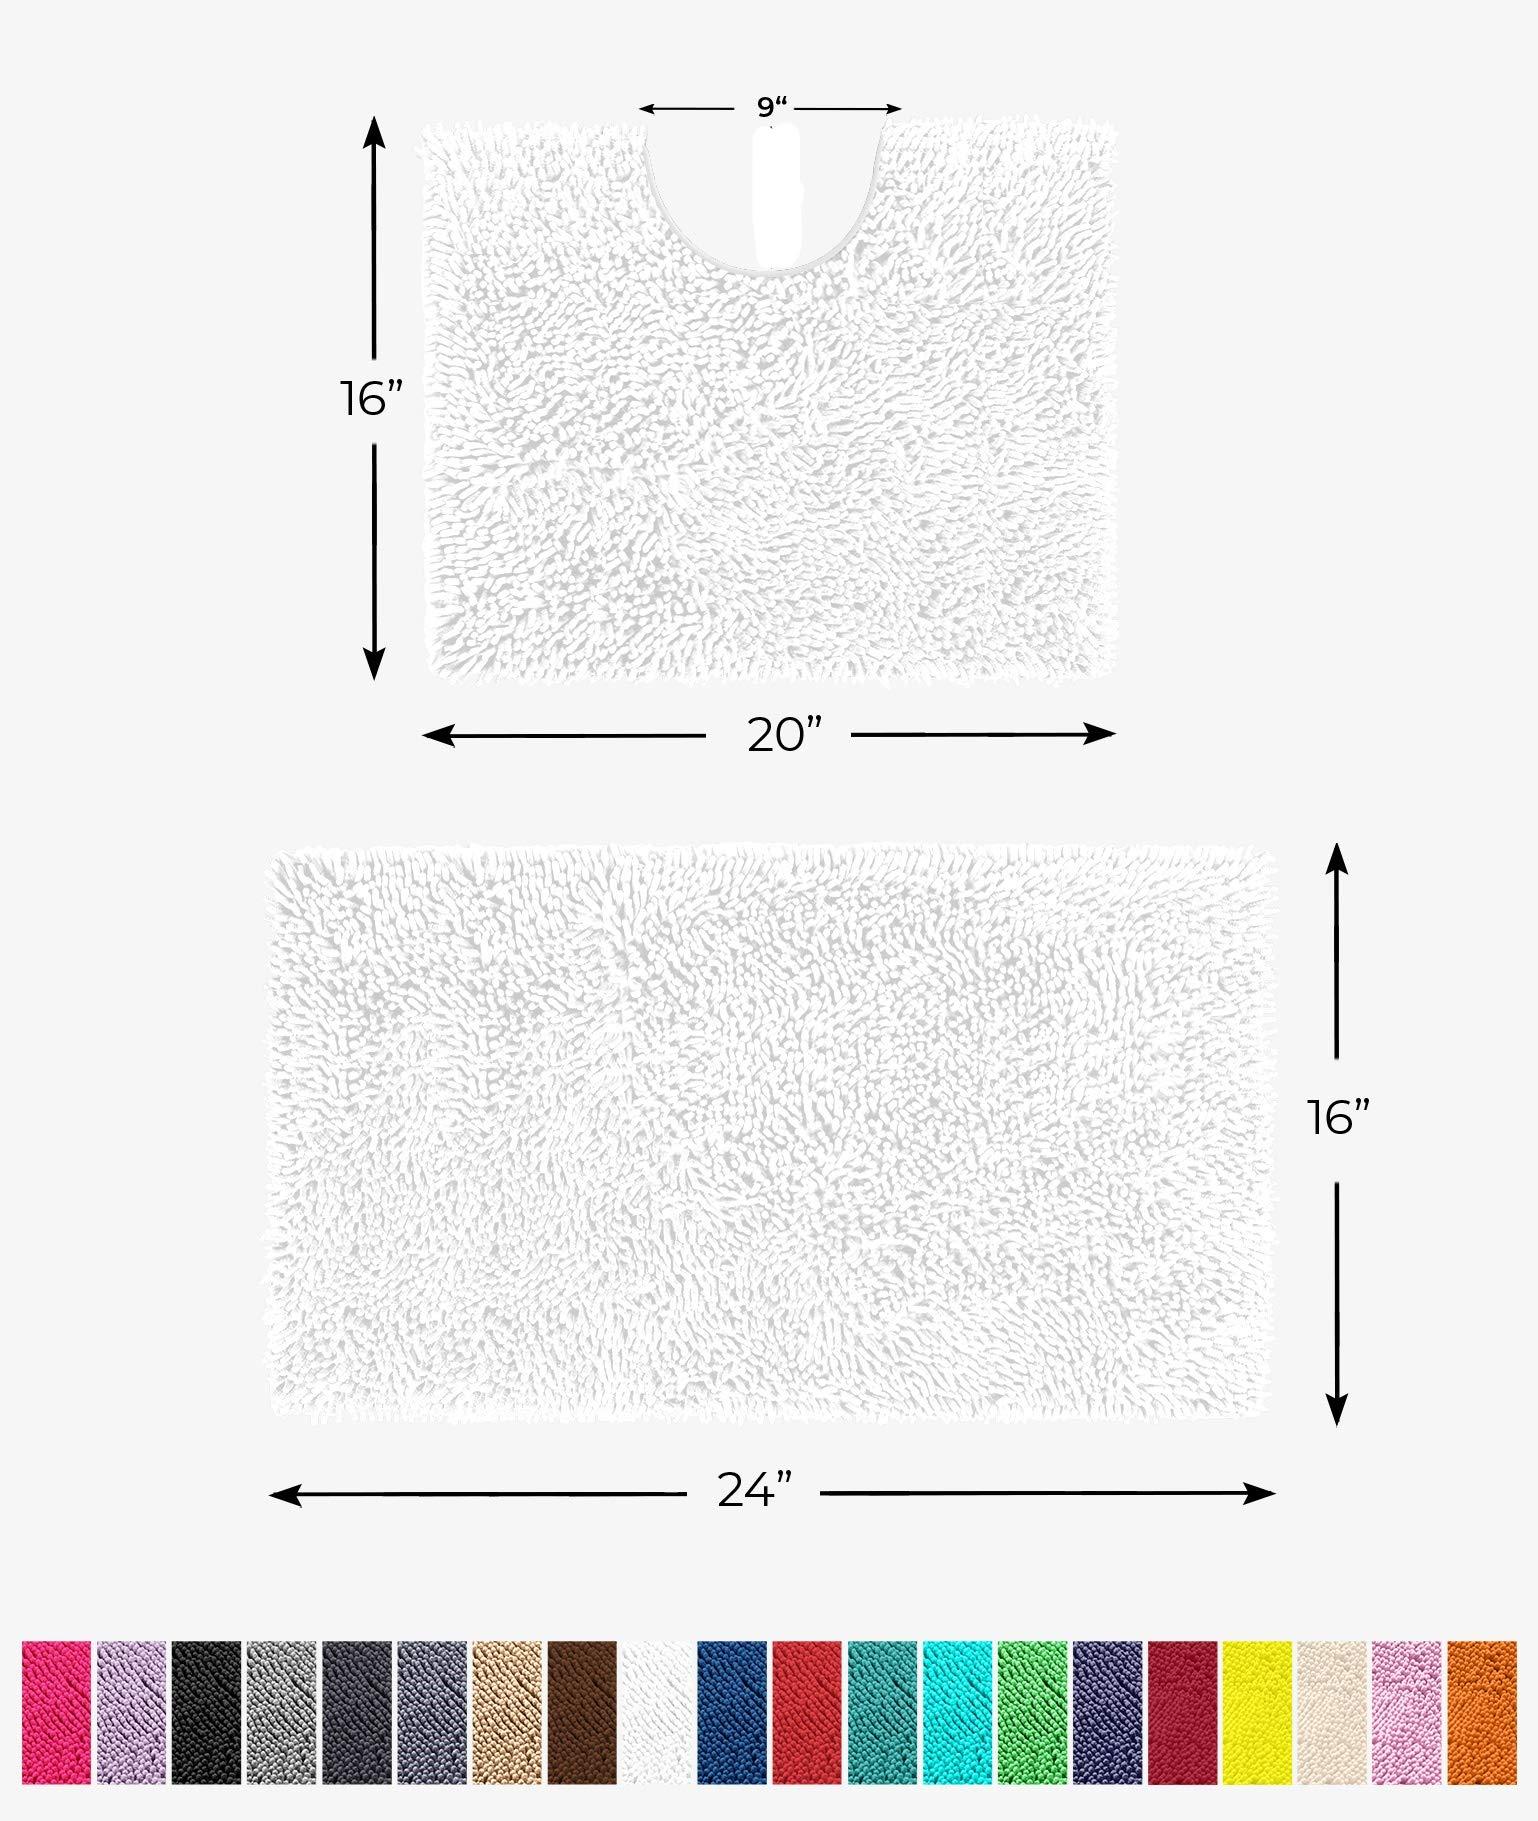 LuxUrux Bathroom Rugs Luxury Chenille 2-Piece Bath Mat Set, Soft Plush Anti-Slip Bath Rug +Toilet Mat.1'' Microfiber Shaggy Carpet, Super Absorbent (Curved Set Small, White)